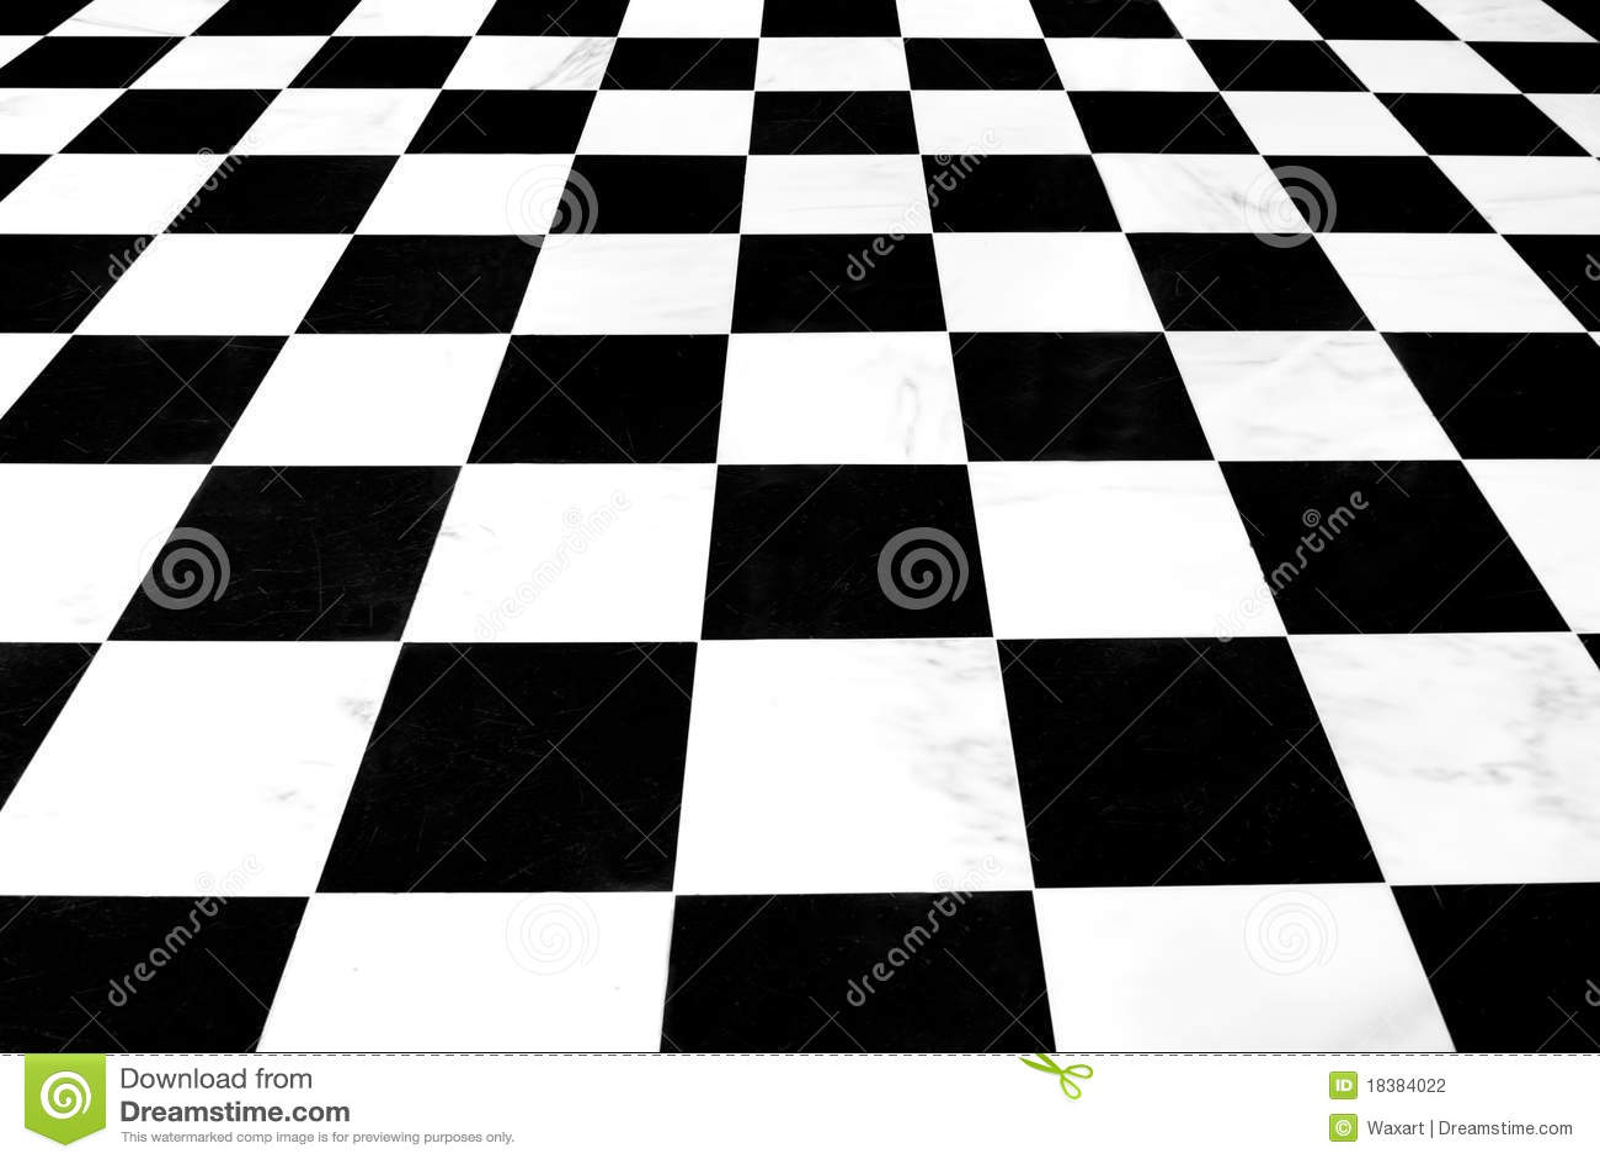 Black and white checkered floor stock photography image for Black and white check floor